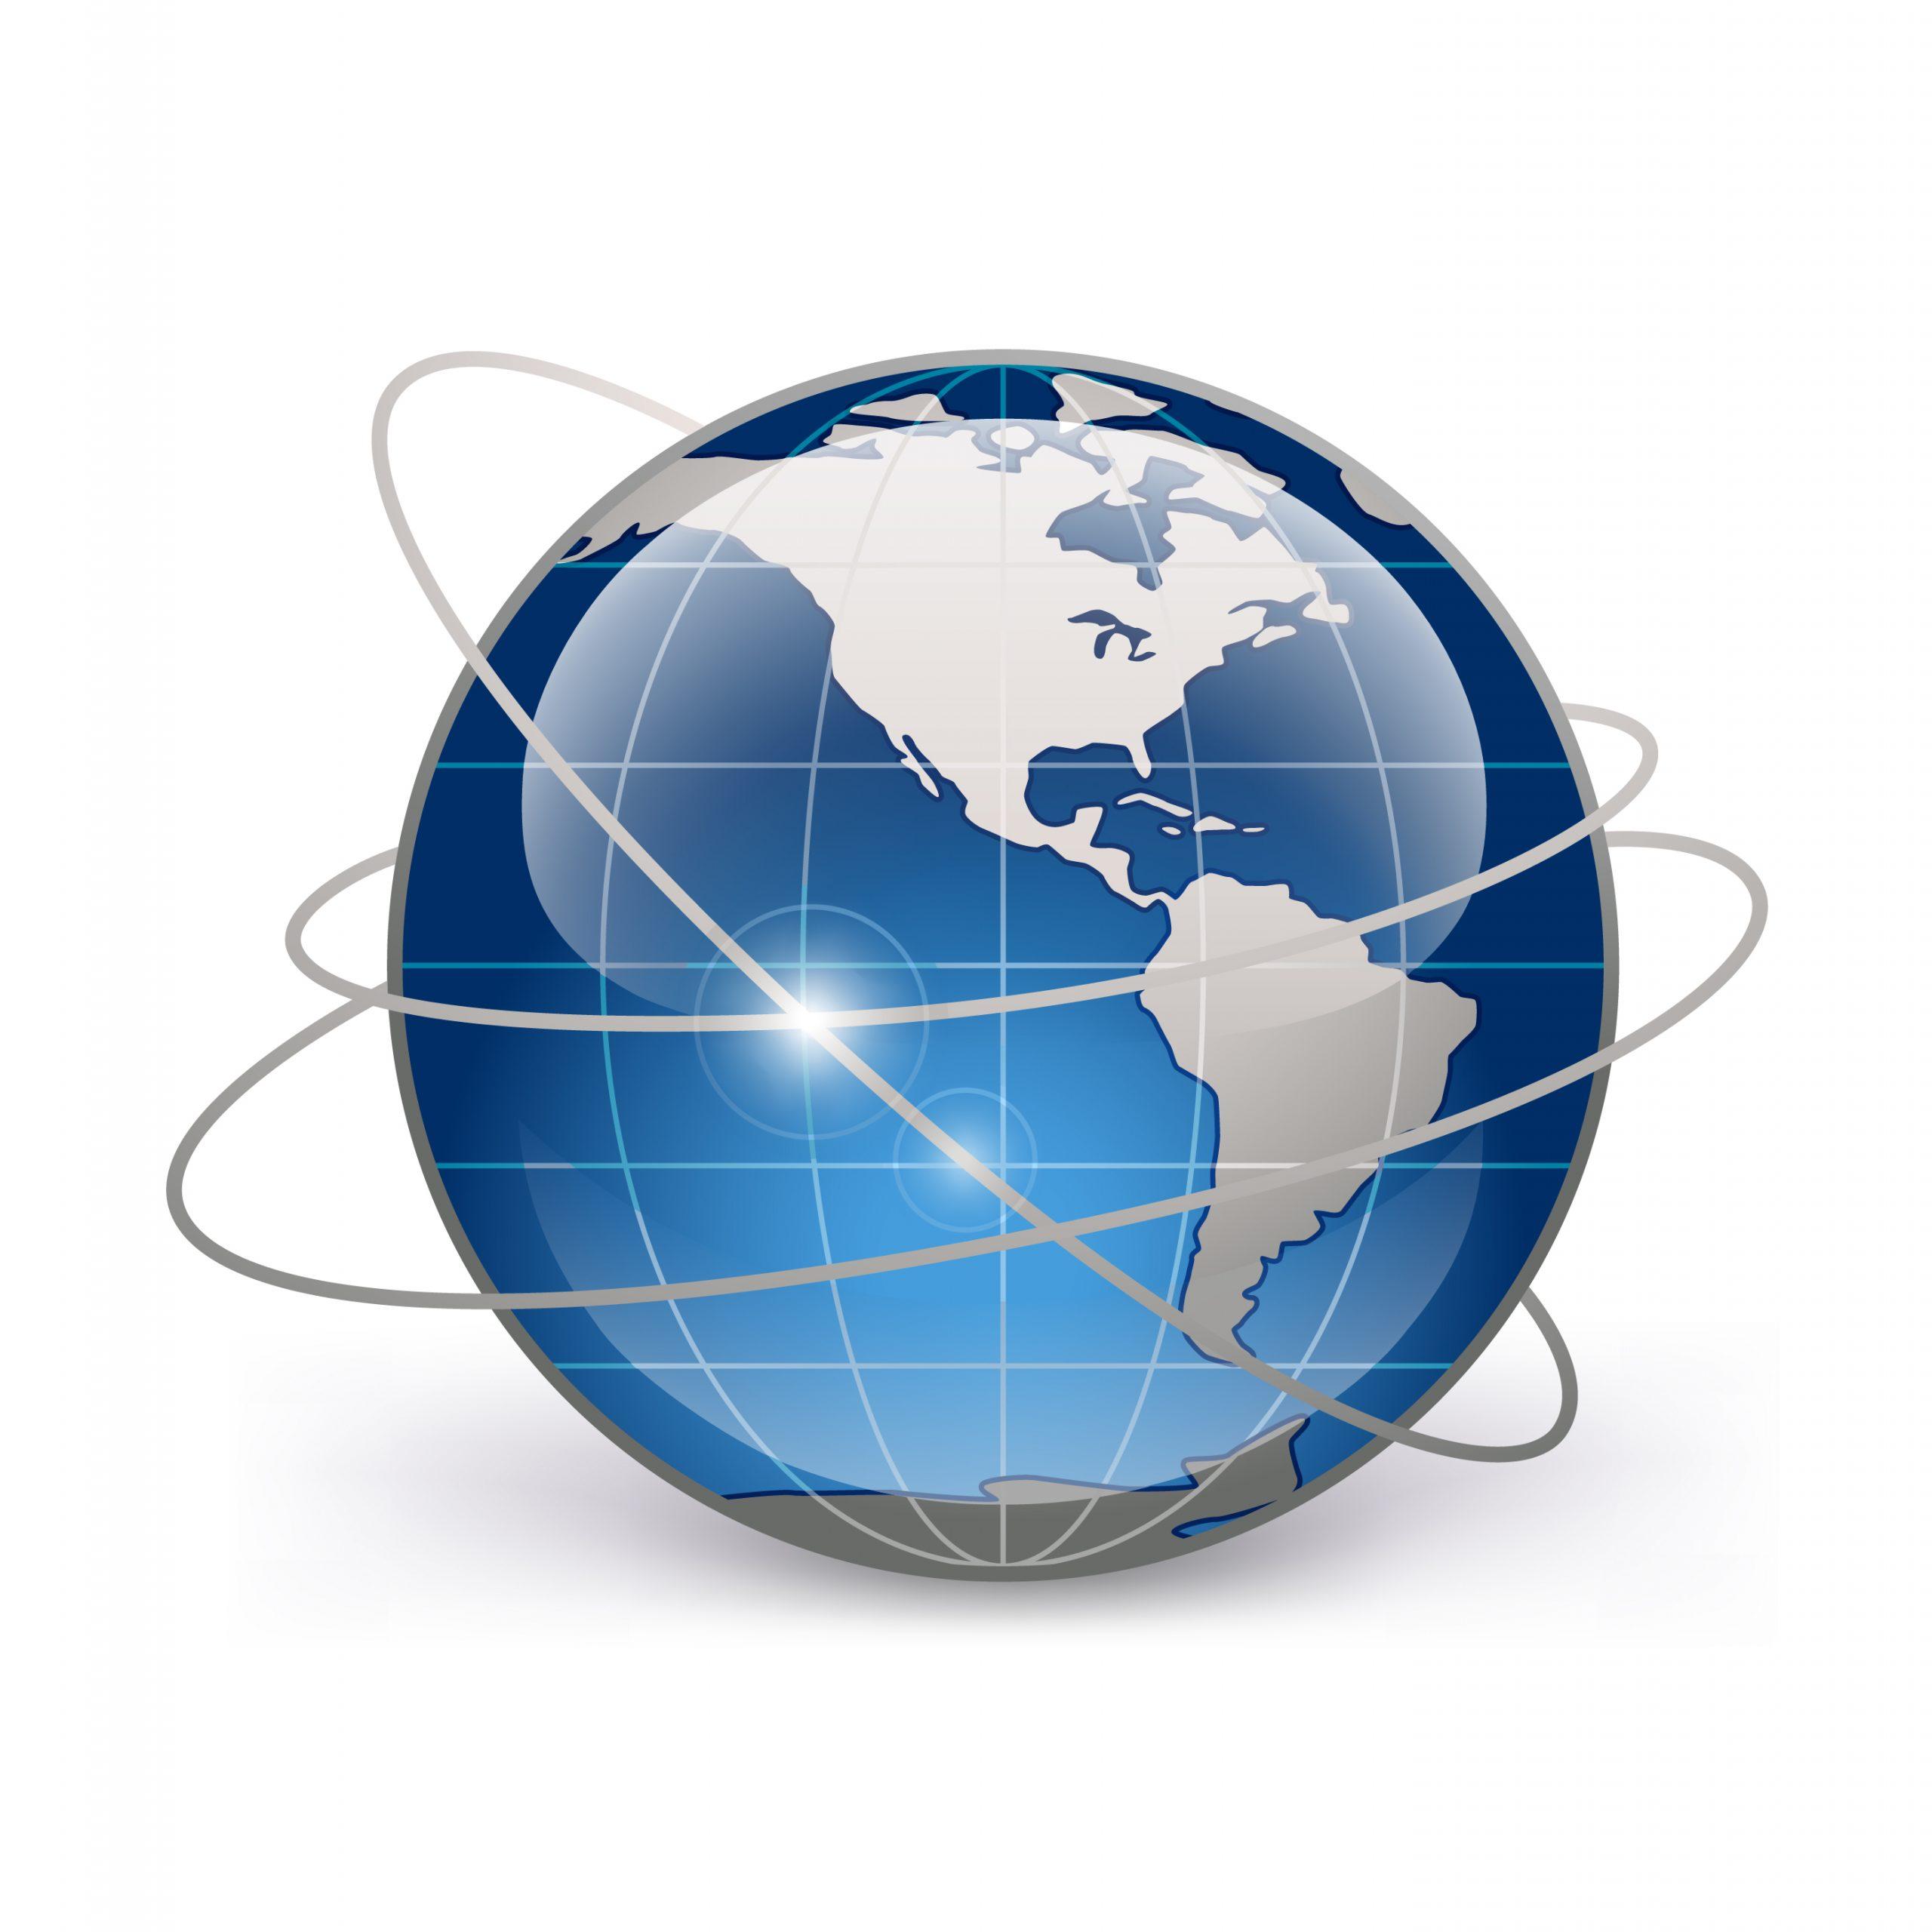 https://depositphotos.com/6675611/stock-illustration-earth.html